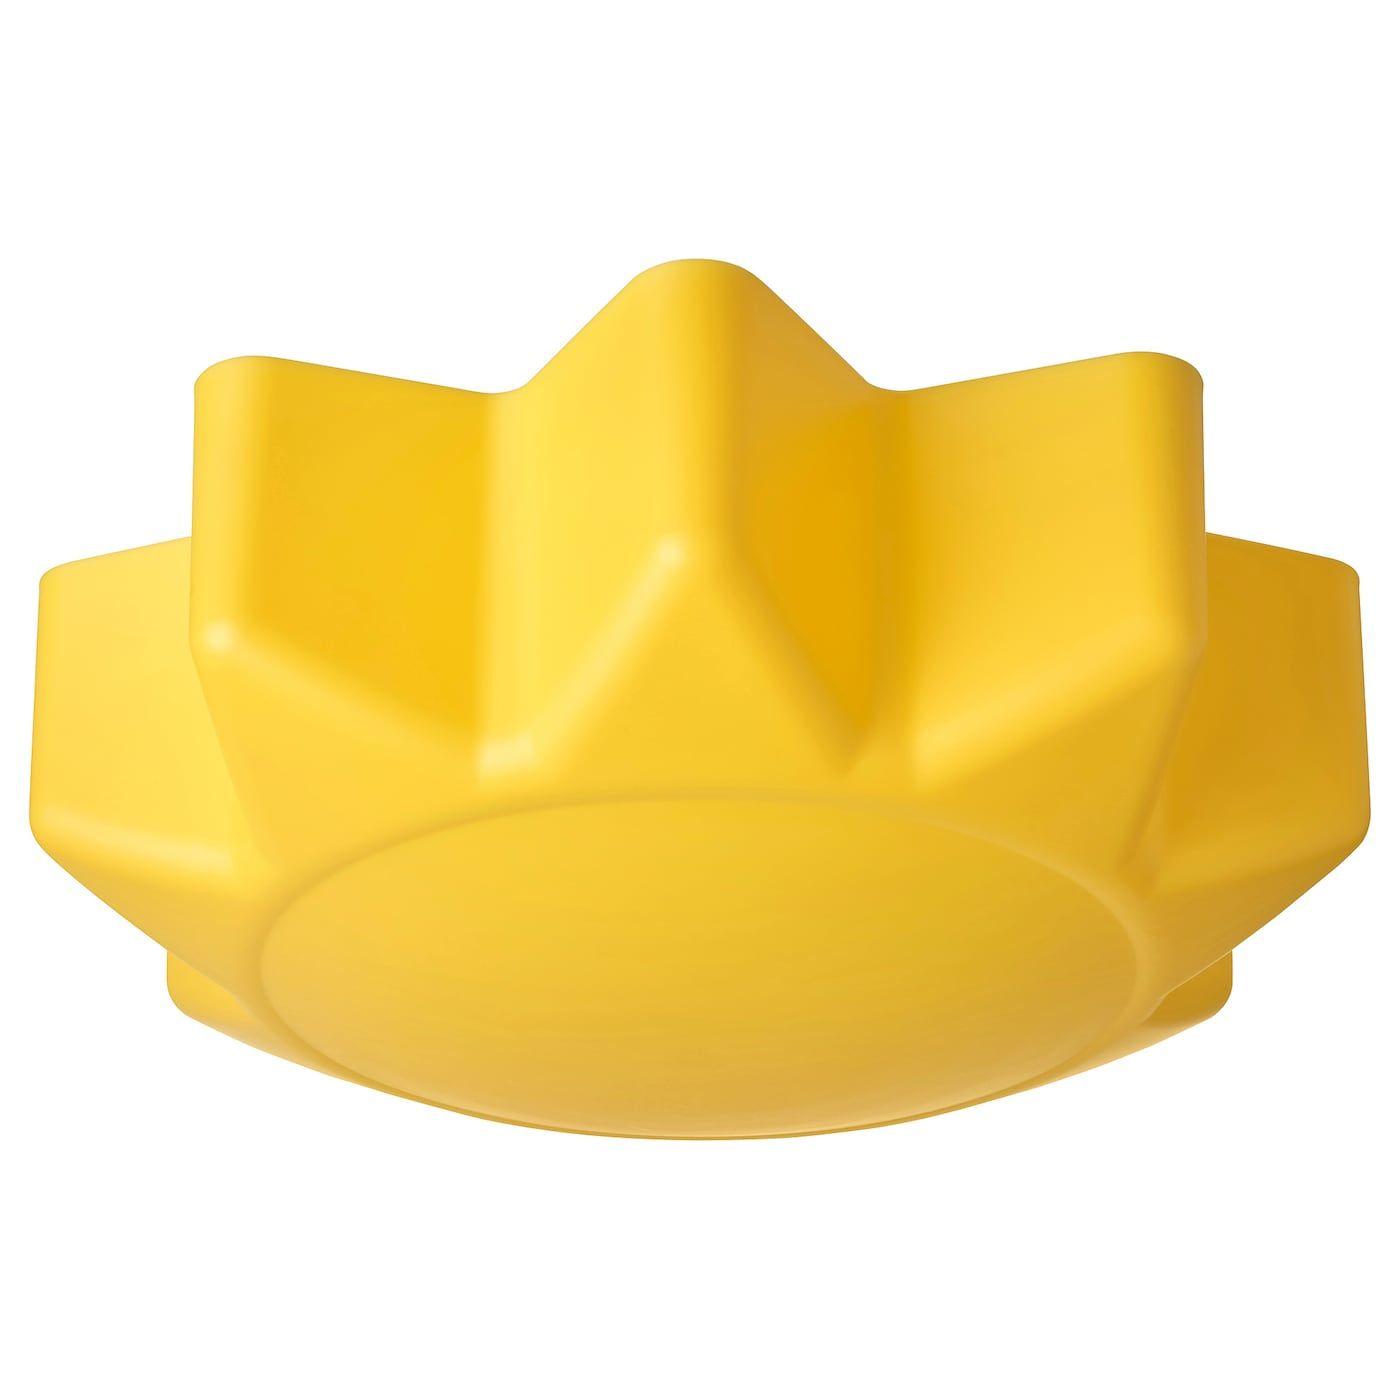 Solhem Deckenleuchte Gelb Sonne Ikea Osterreich In 2020 Ceiling Lamp Yellow Pendant Lamp Lamp